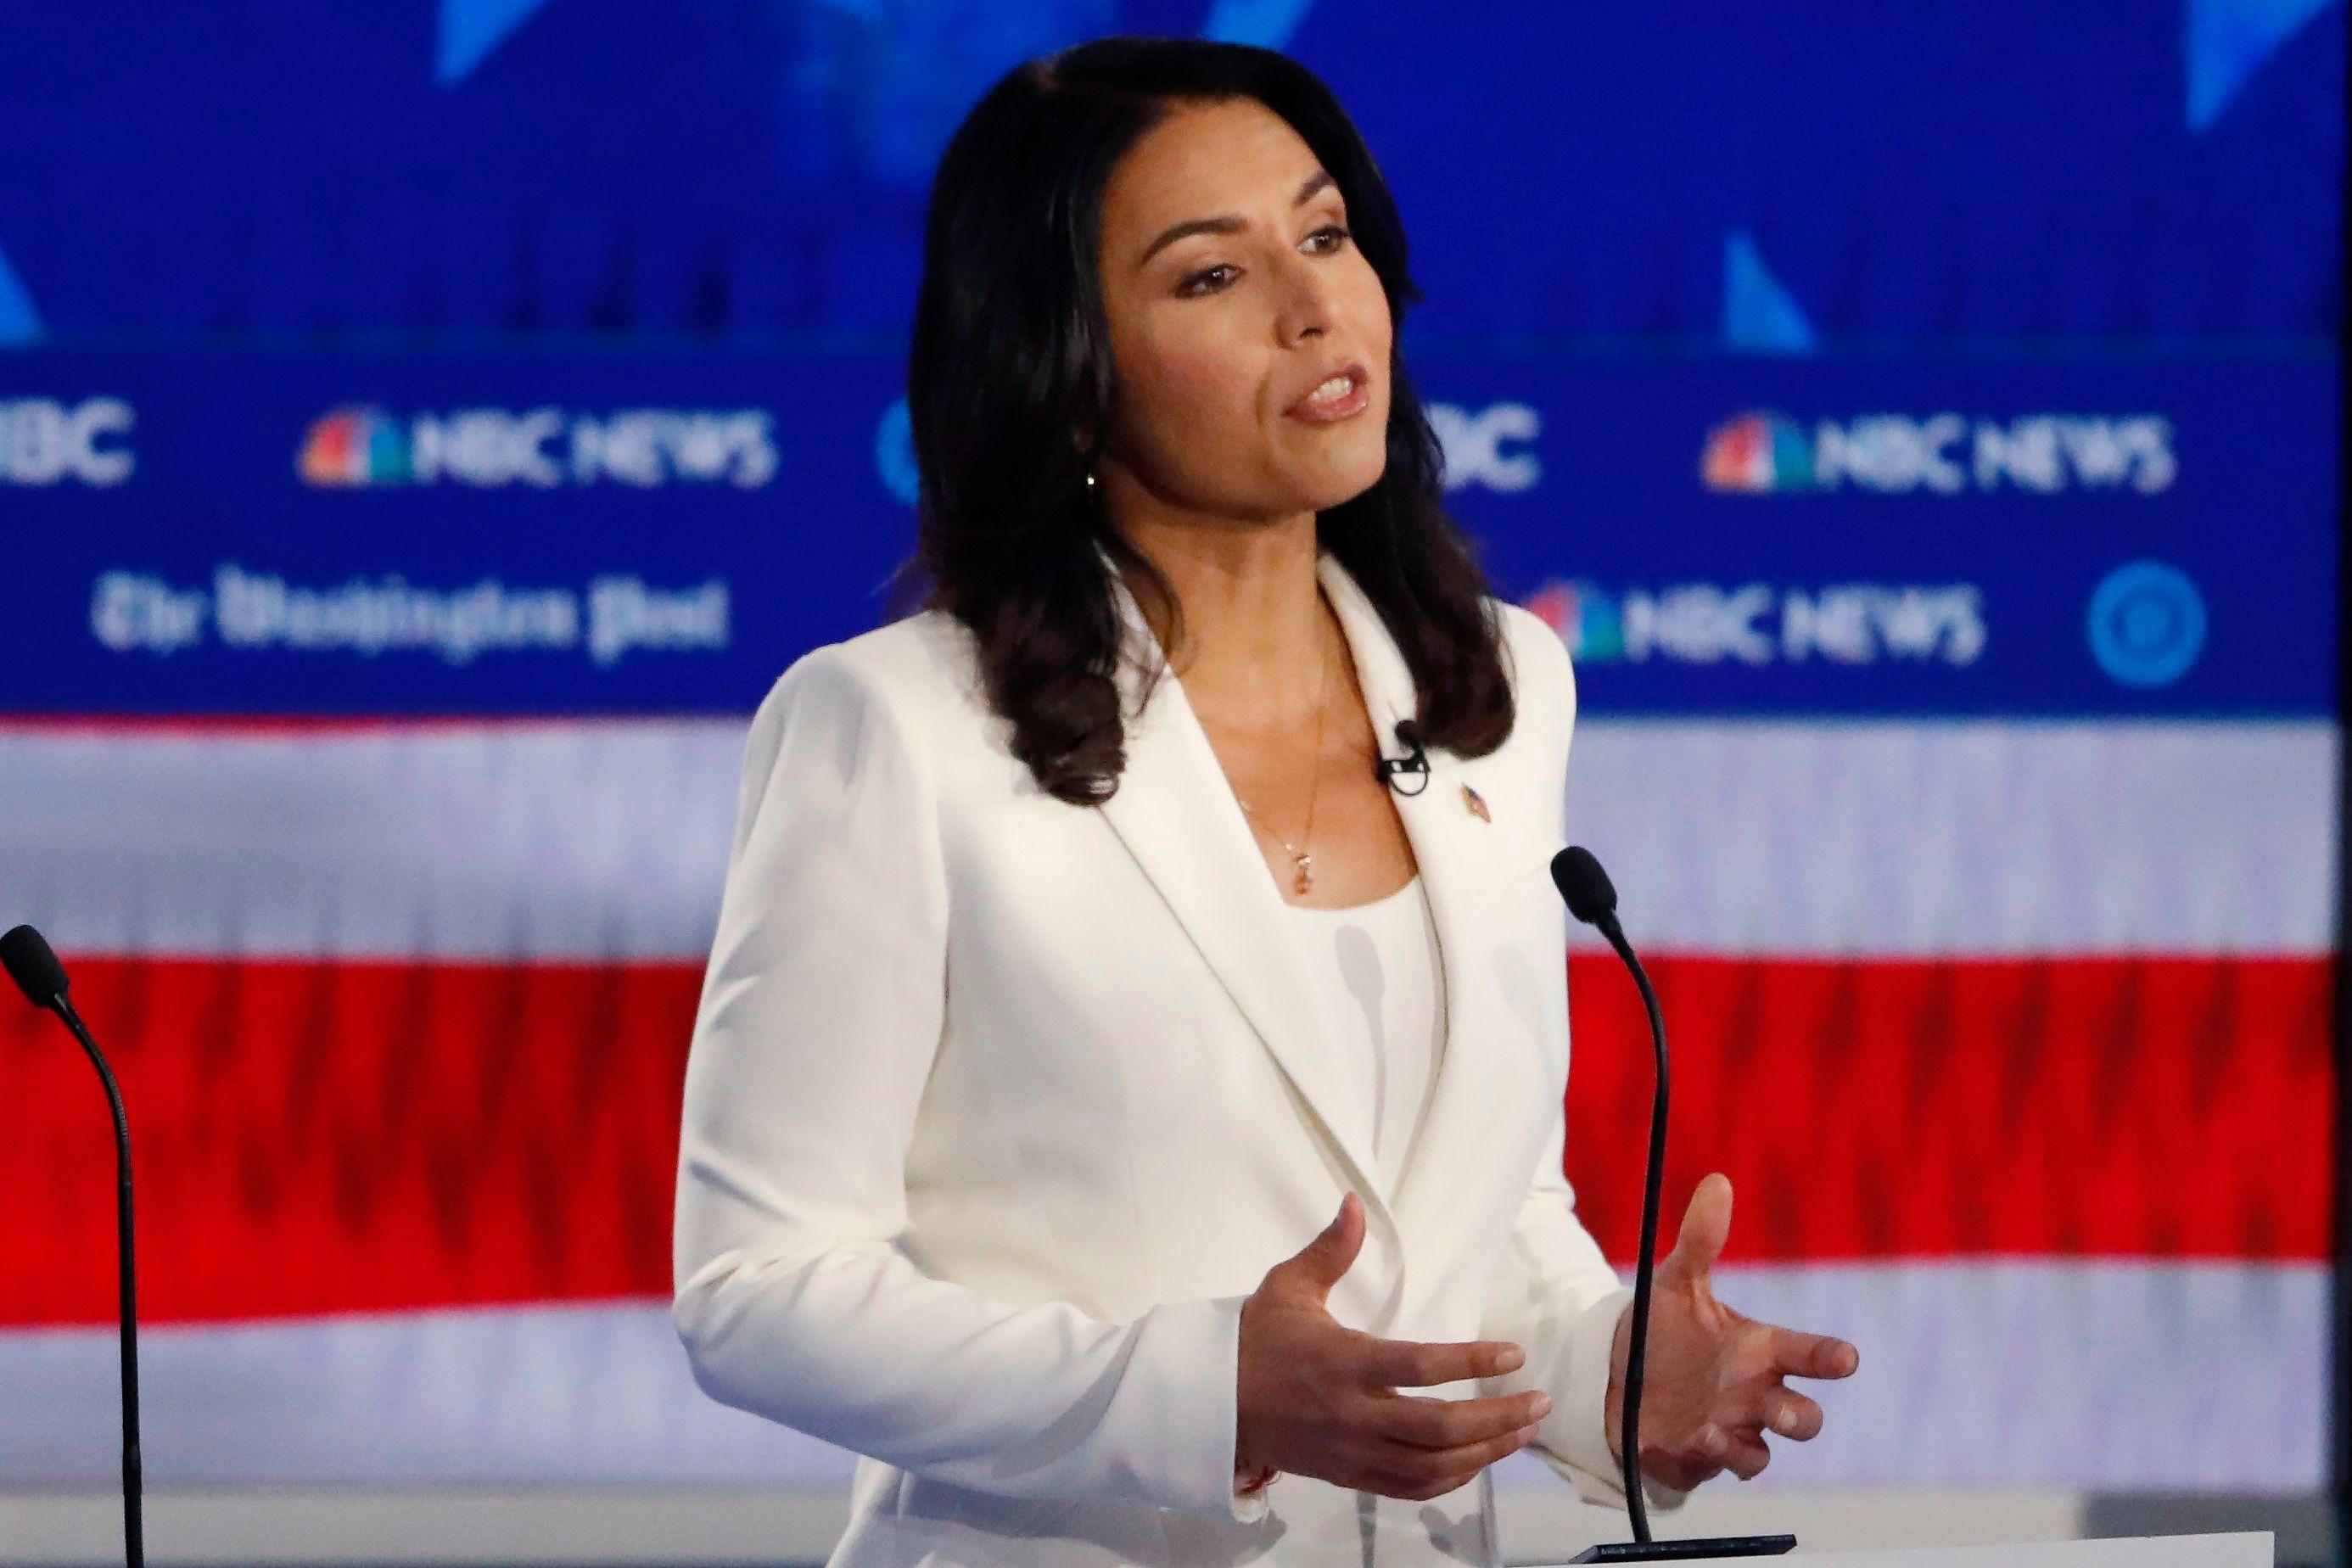 Tulsi Gabbard Tussles With Fellow Democrats Over Fox News Appearances Deadline